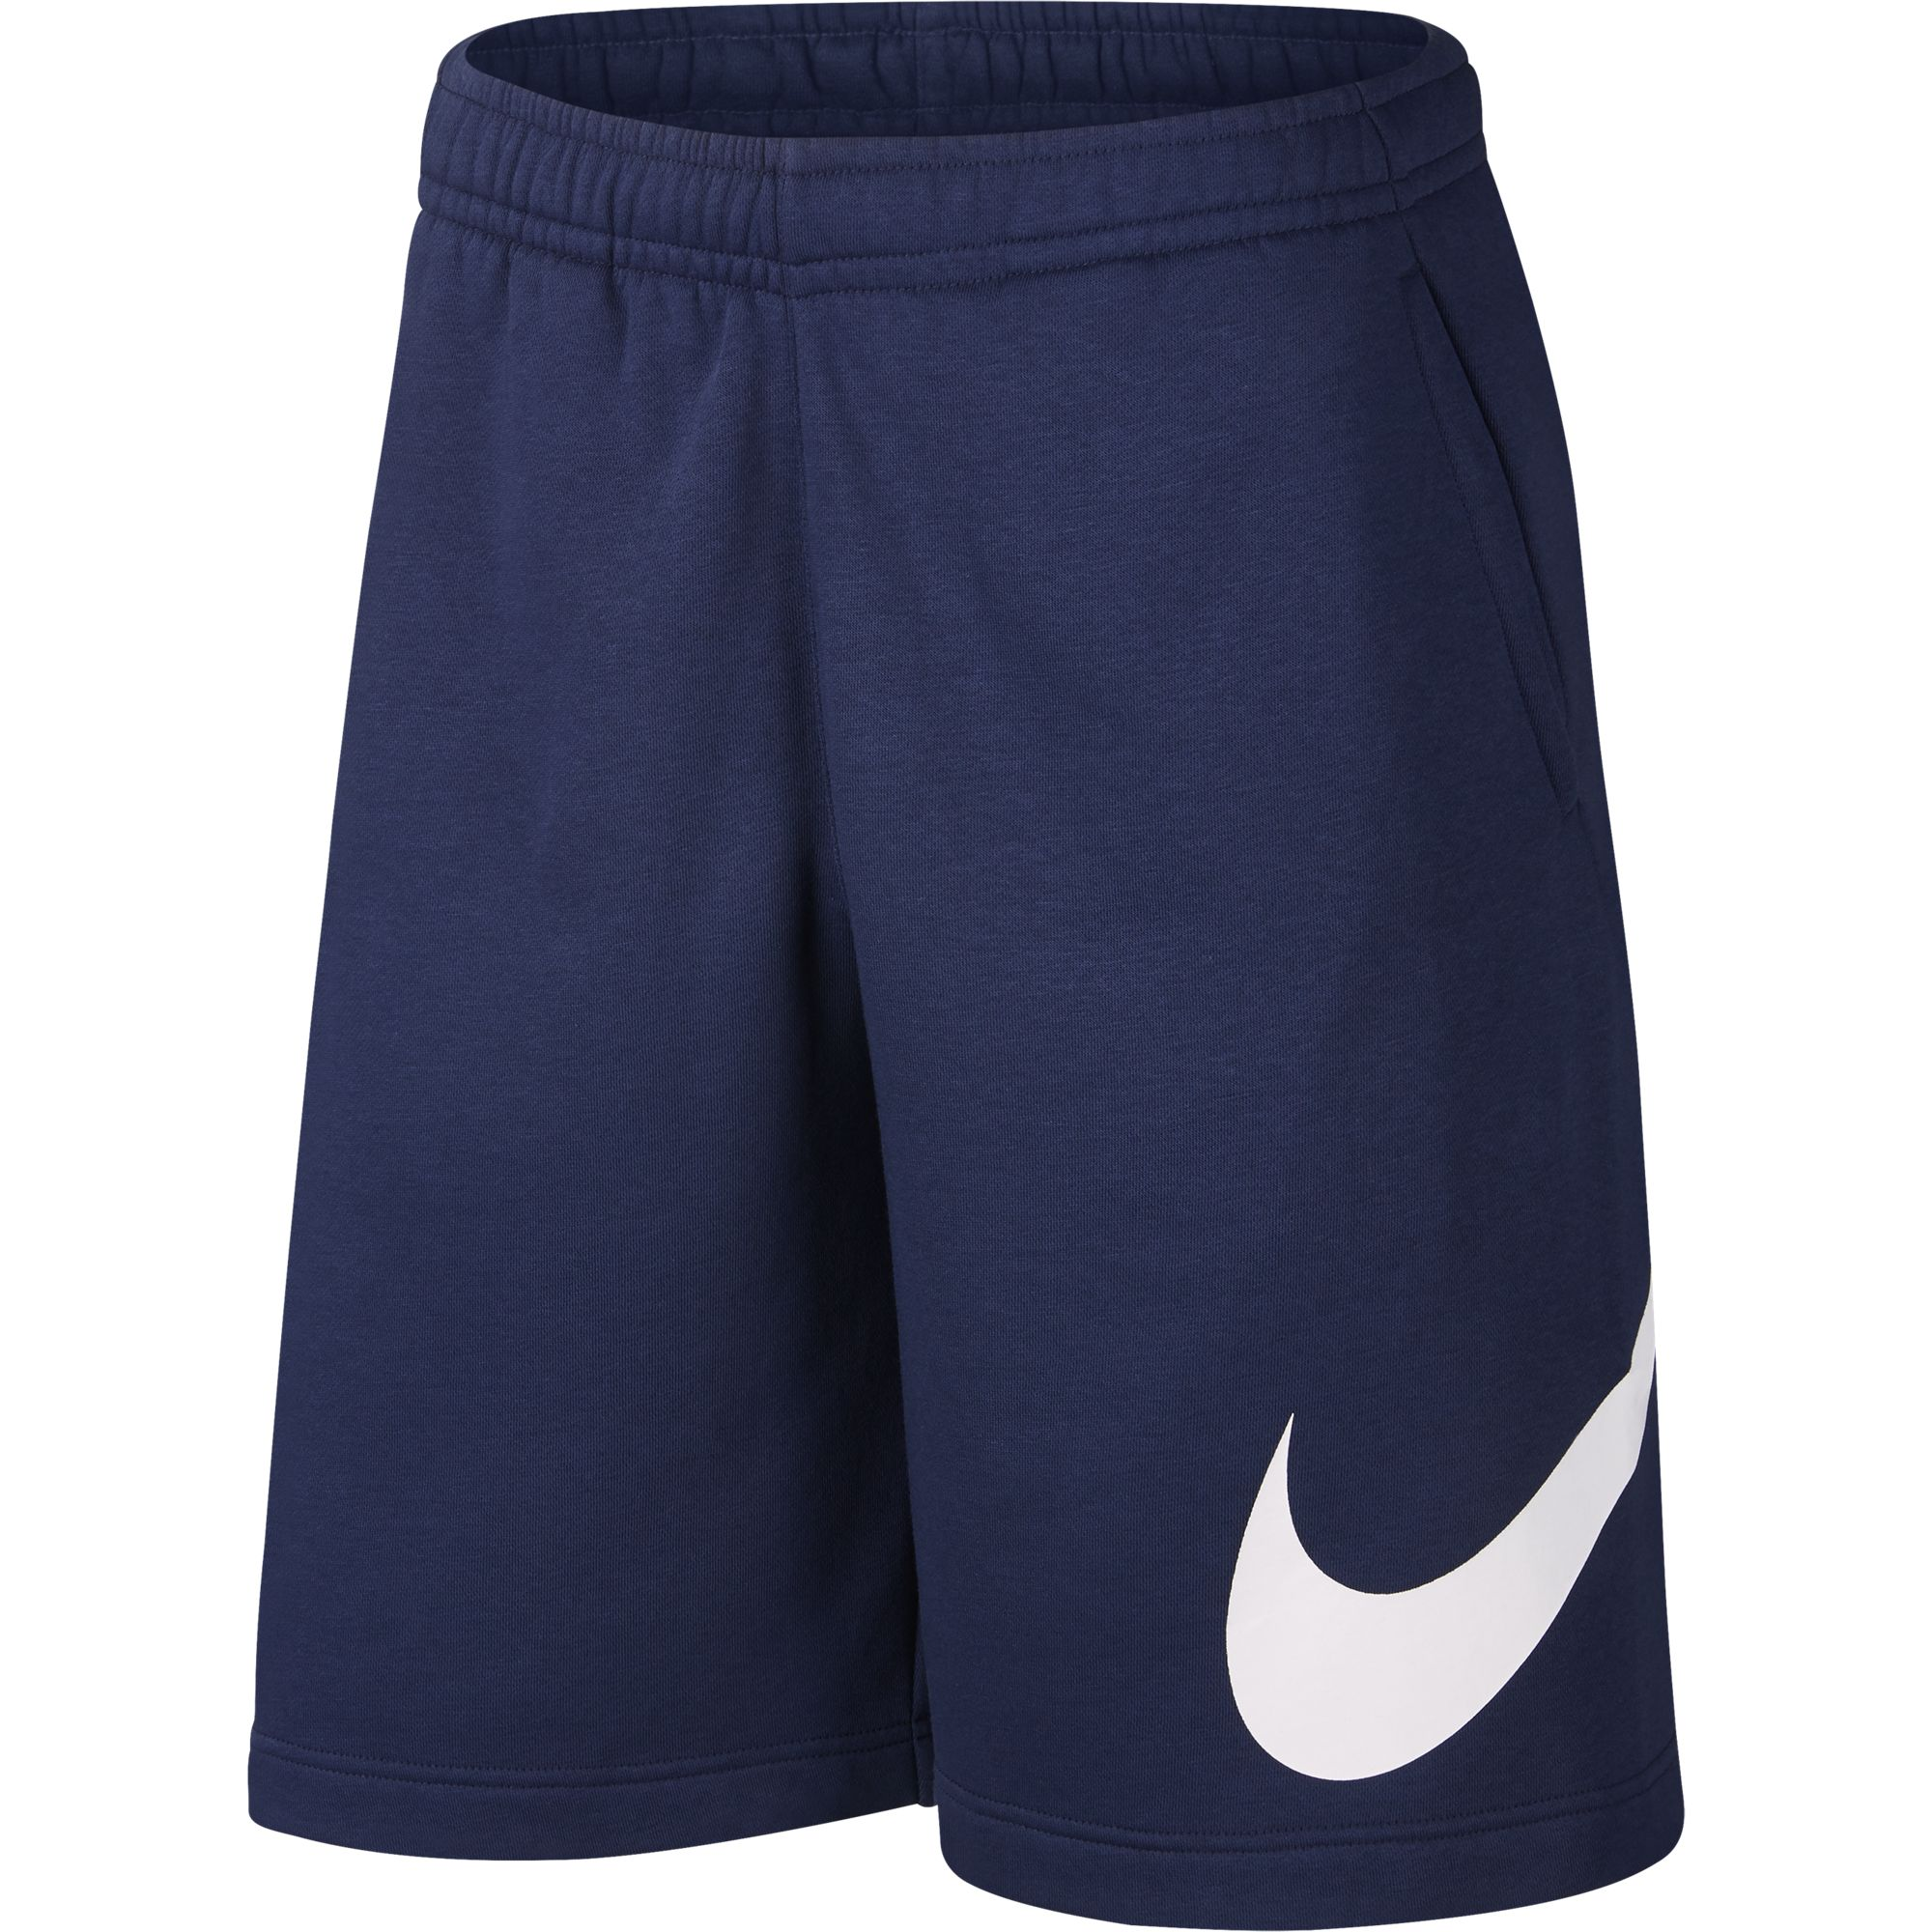 Men's Sportwear Club Graphic Shorts, Navy, swatch